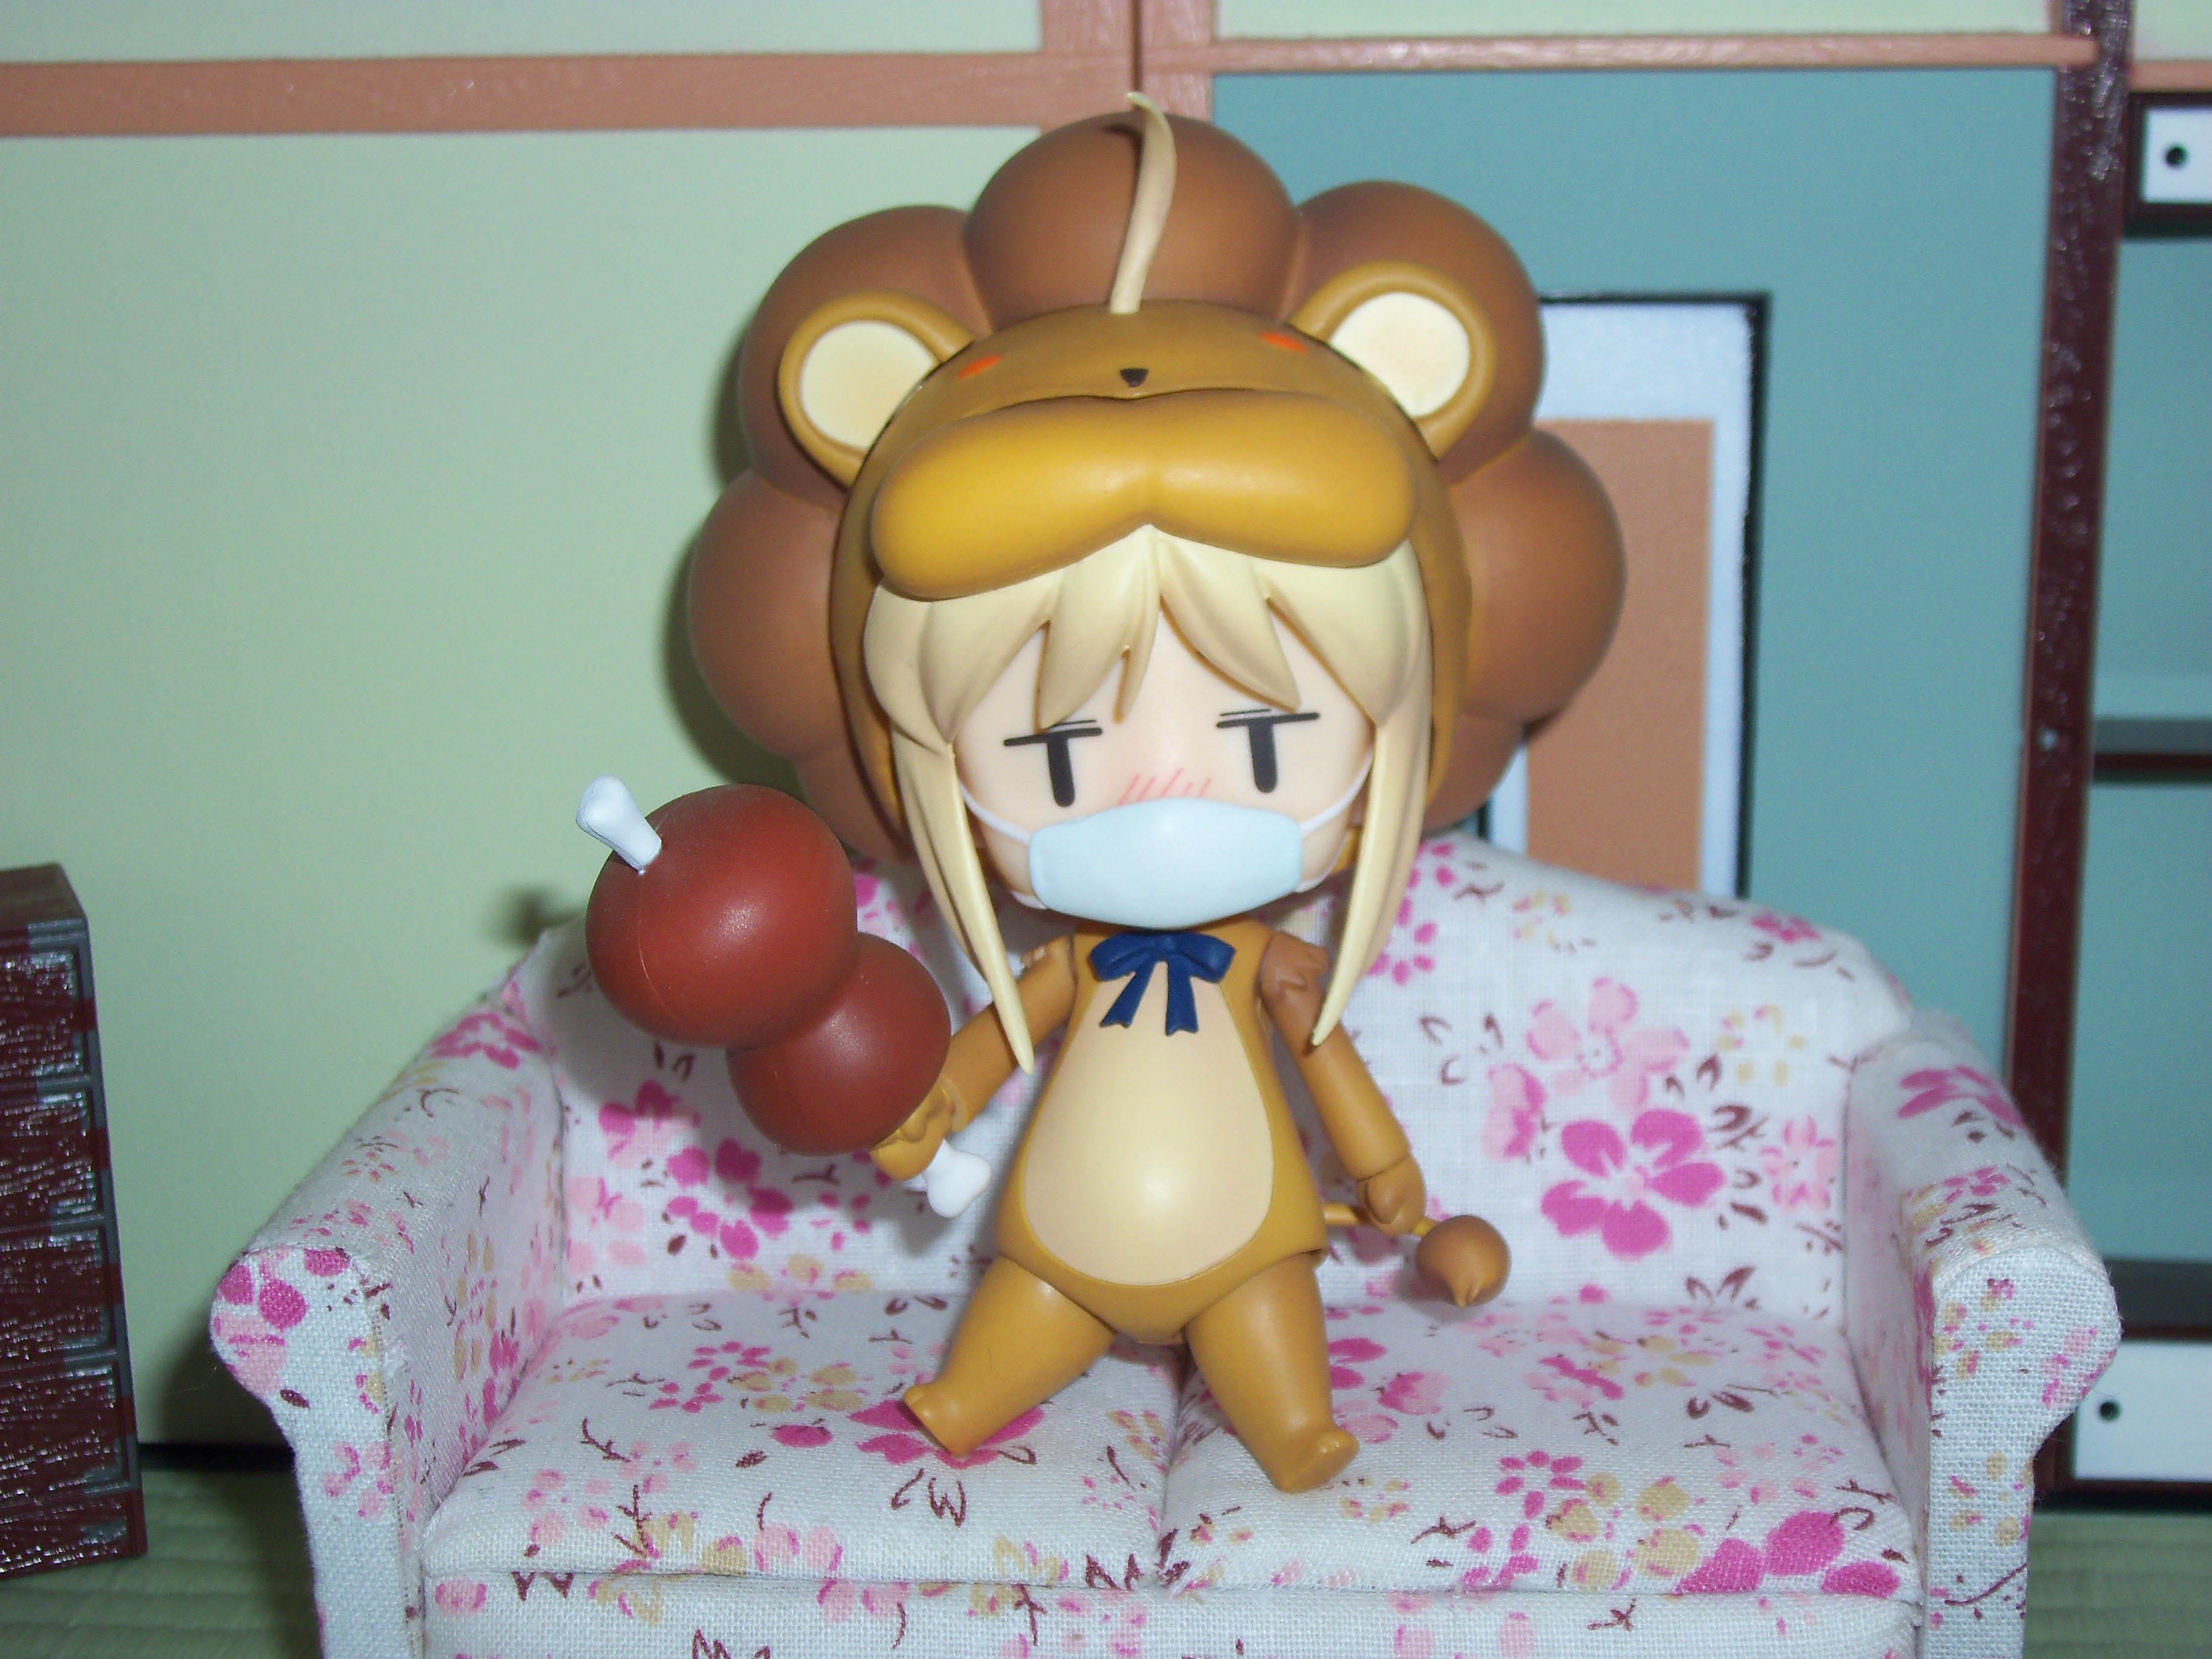 nendoroid saber_lion couch cold nendoroid_playset sick haru-chan